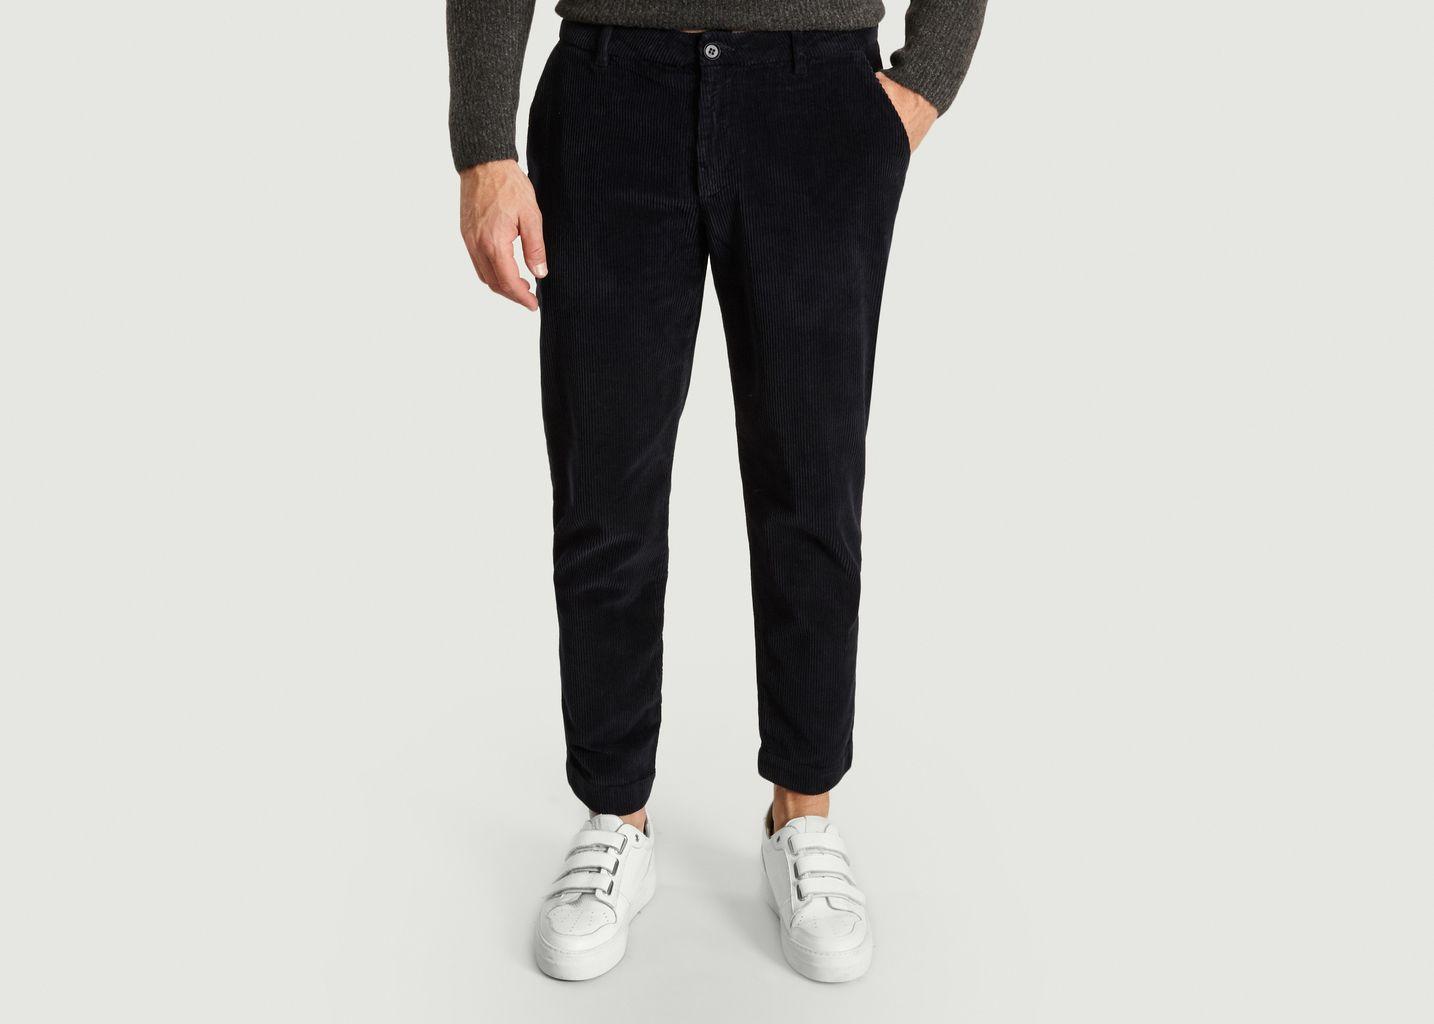 Pantalon Chino Nukisville en Velours - American Vintage